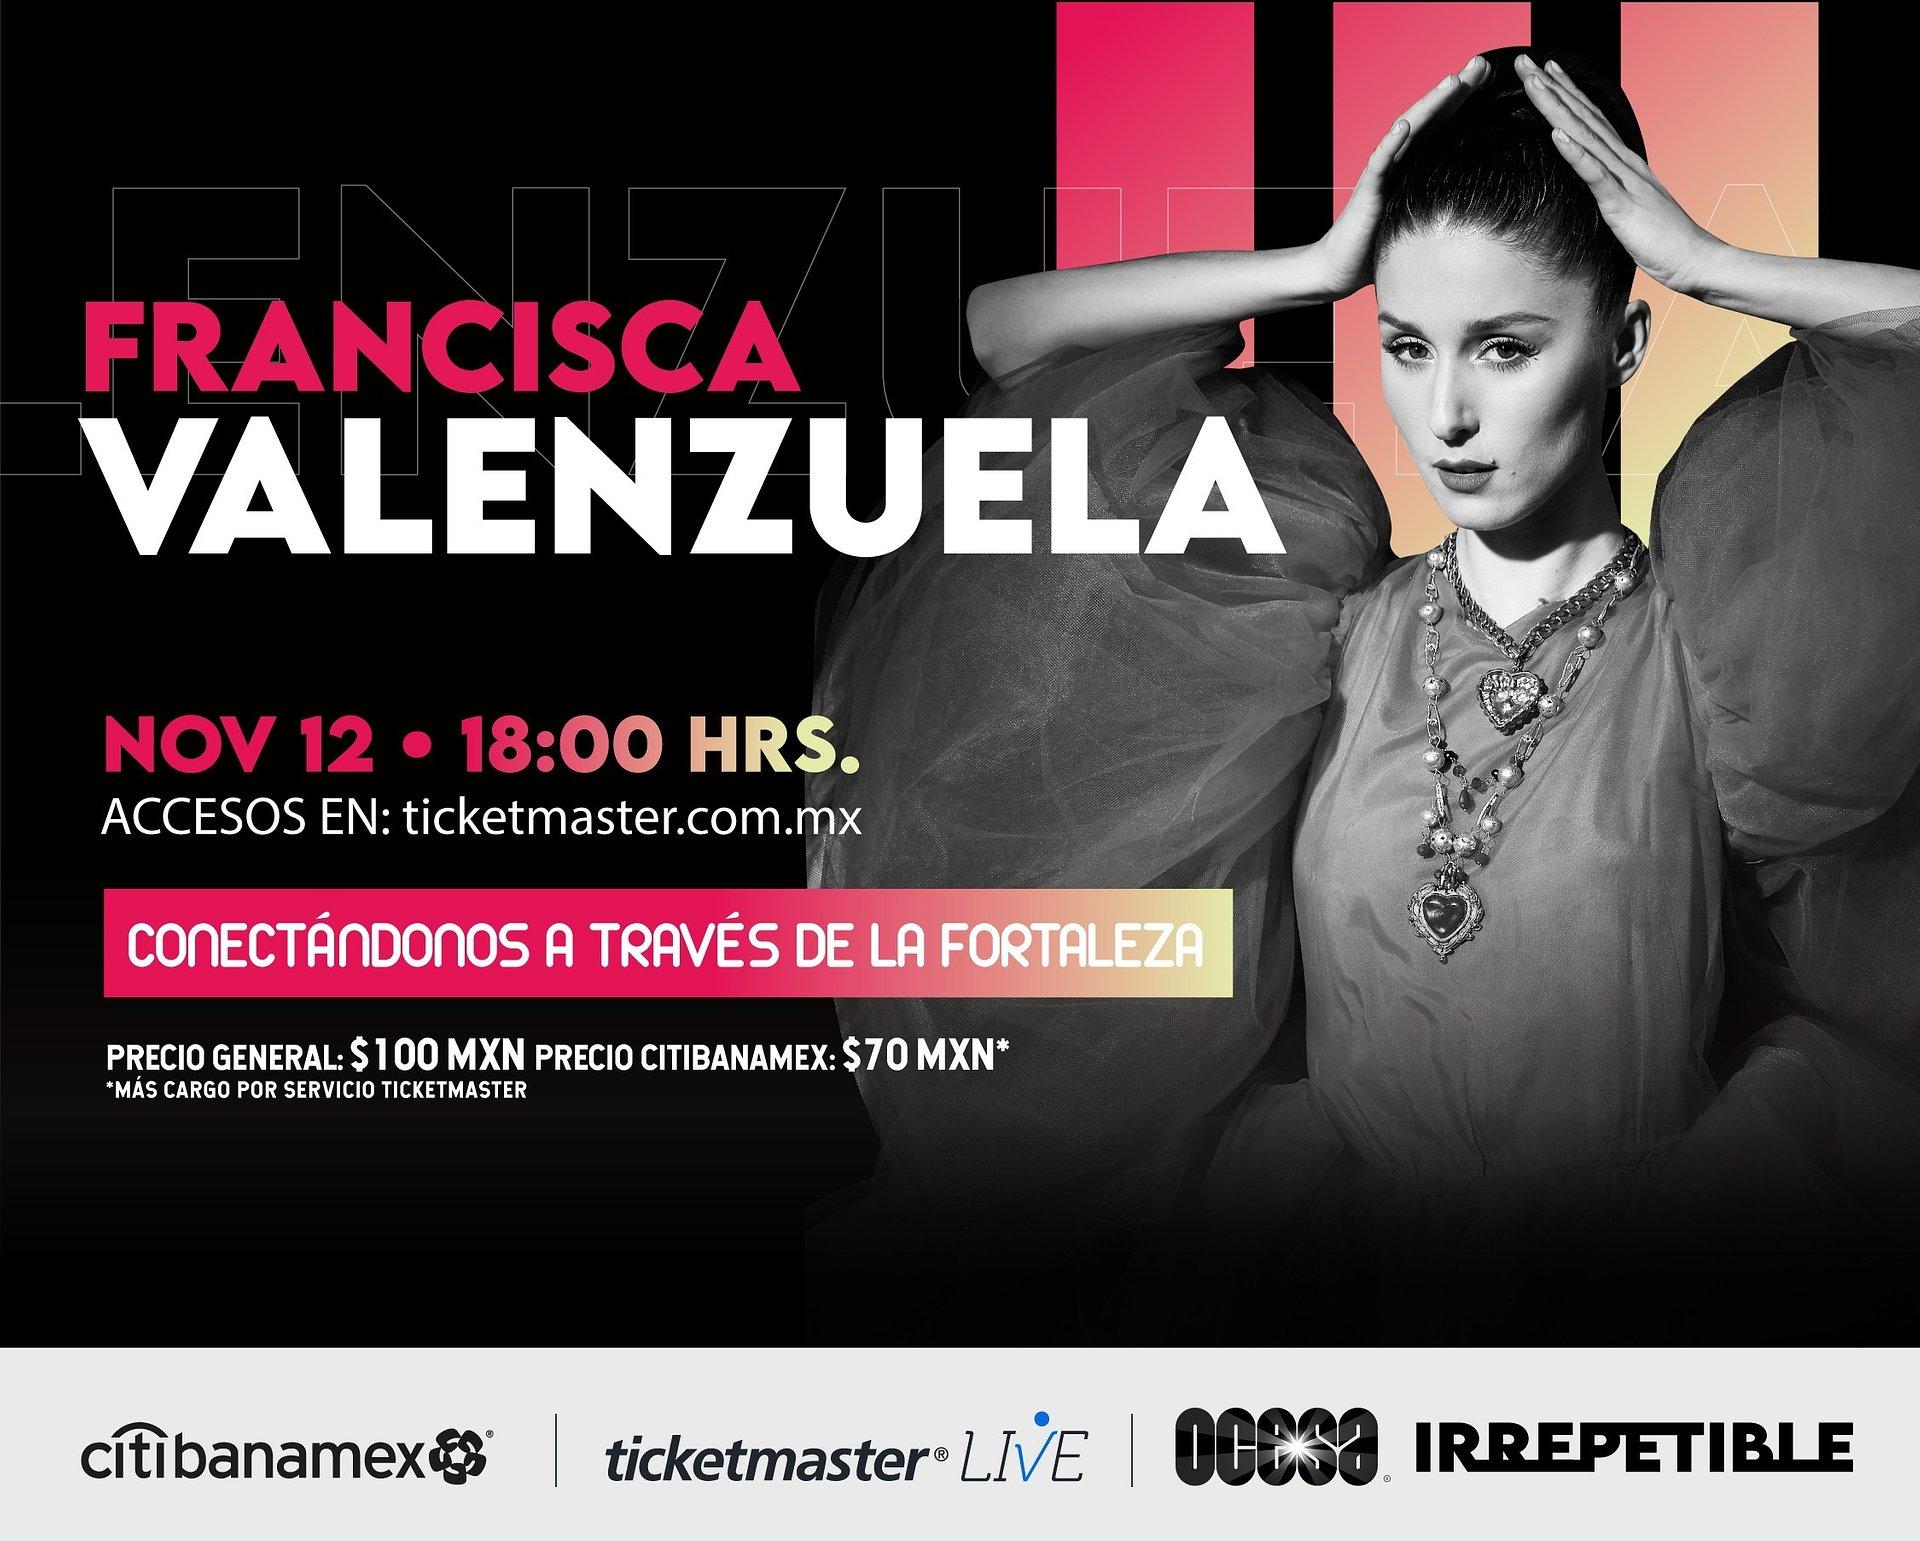 Francisca Valenzuela en IRREPETIBLE